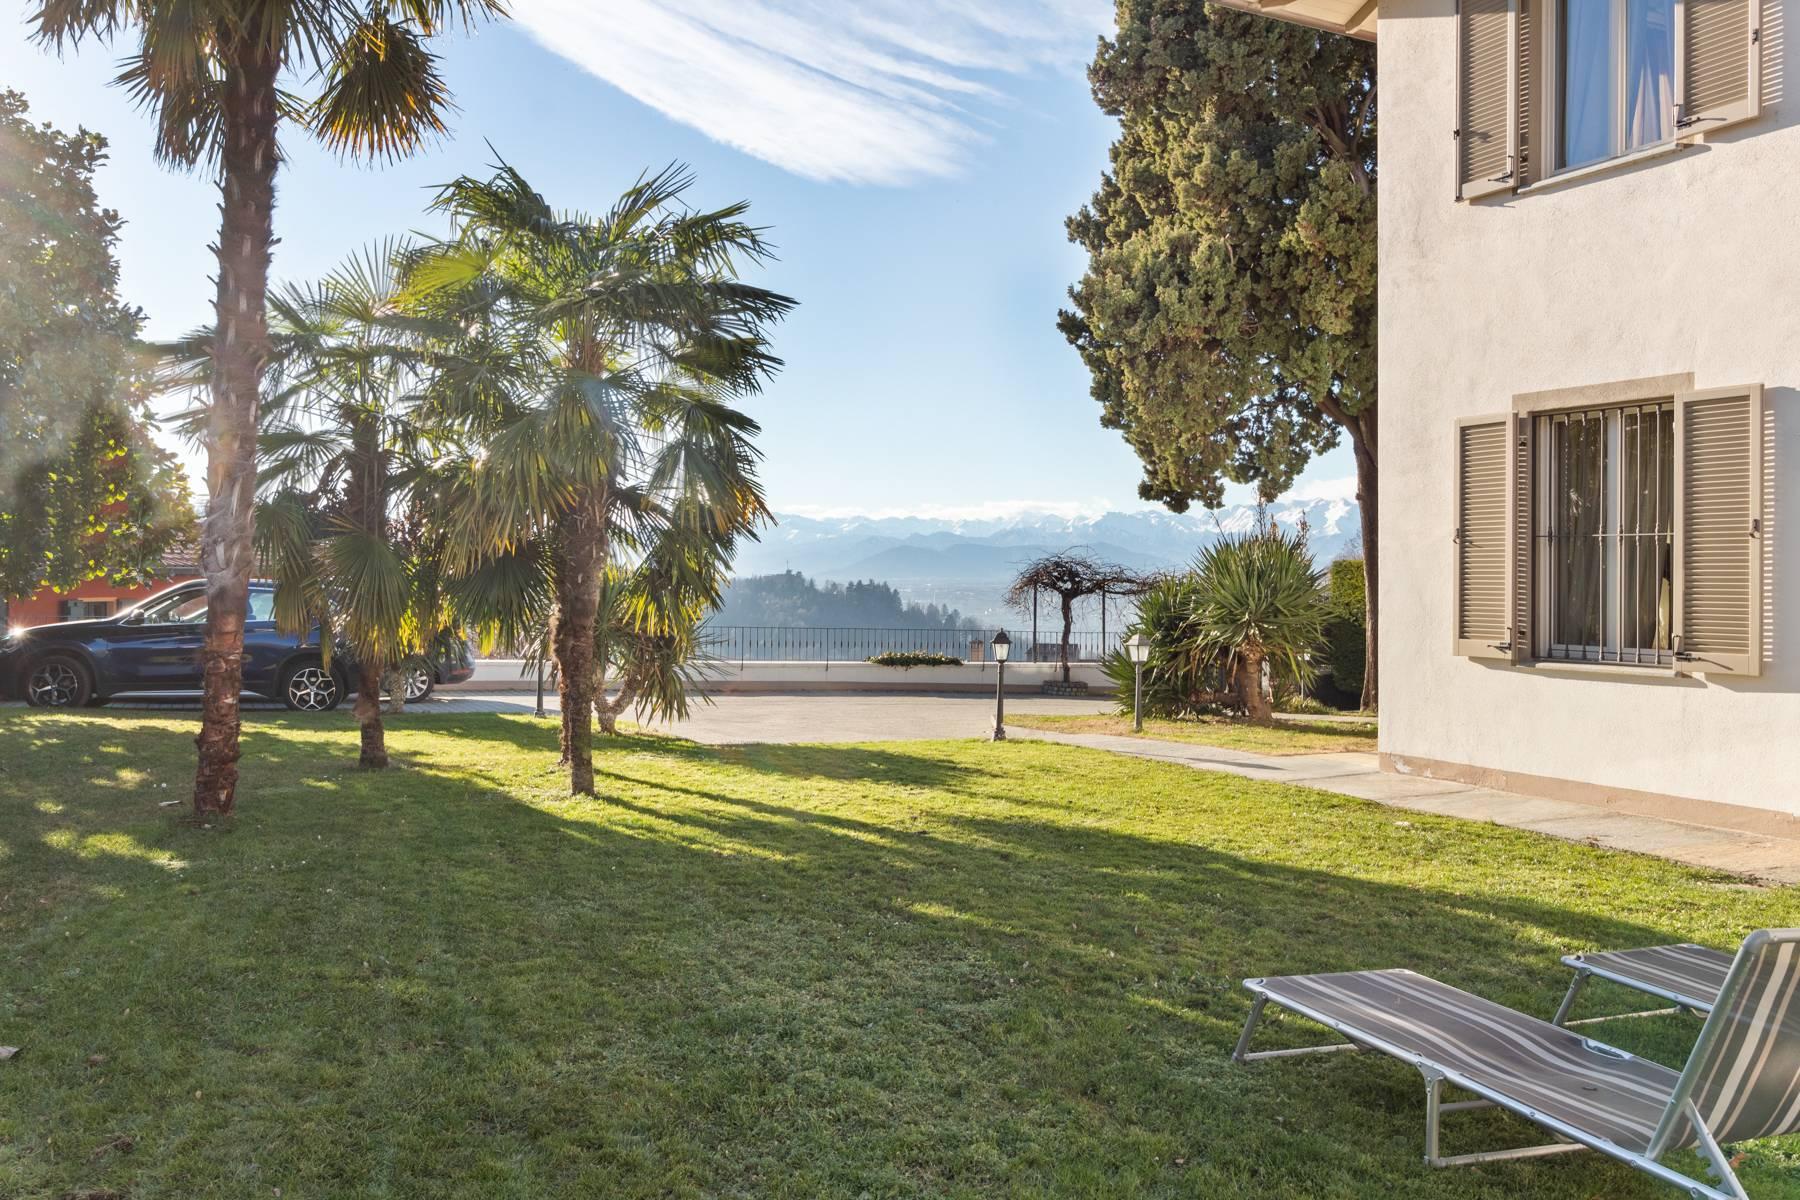 Casa indipendente in Vendita a Torino: 5 locali, 270 mq - Foto 8